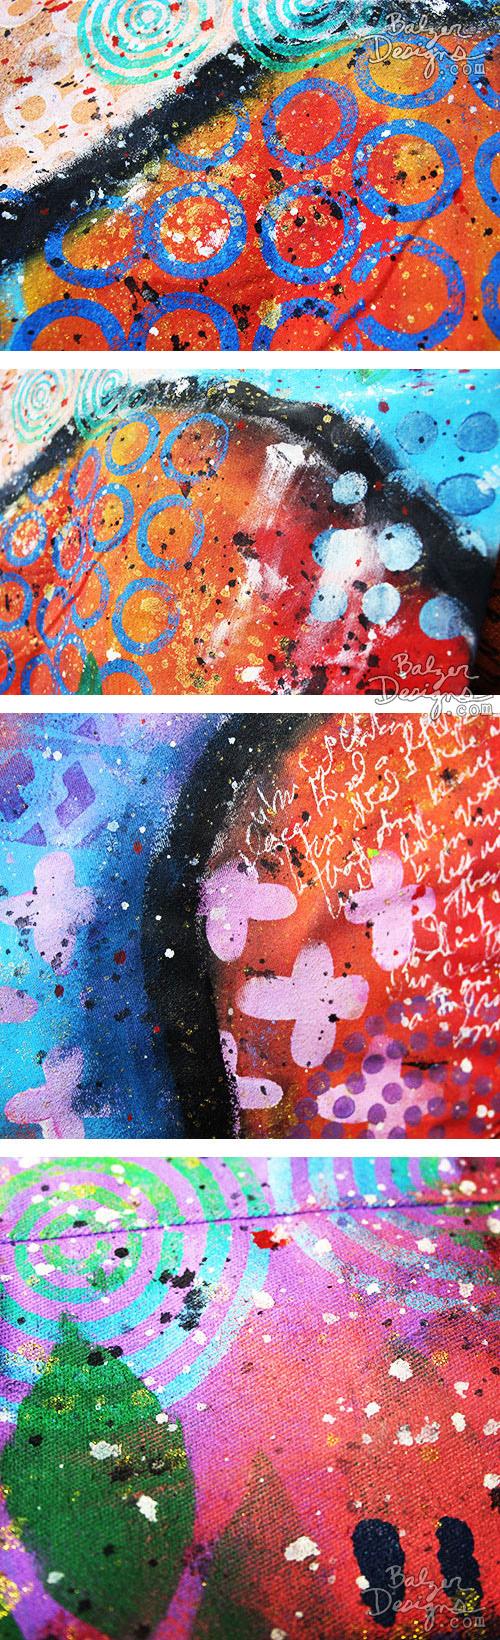 from the Balzer Designs Blog: Julie & the Amazing Technicolor Dream Coat